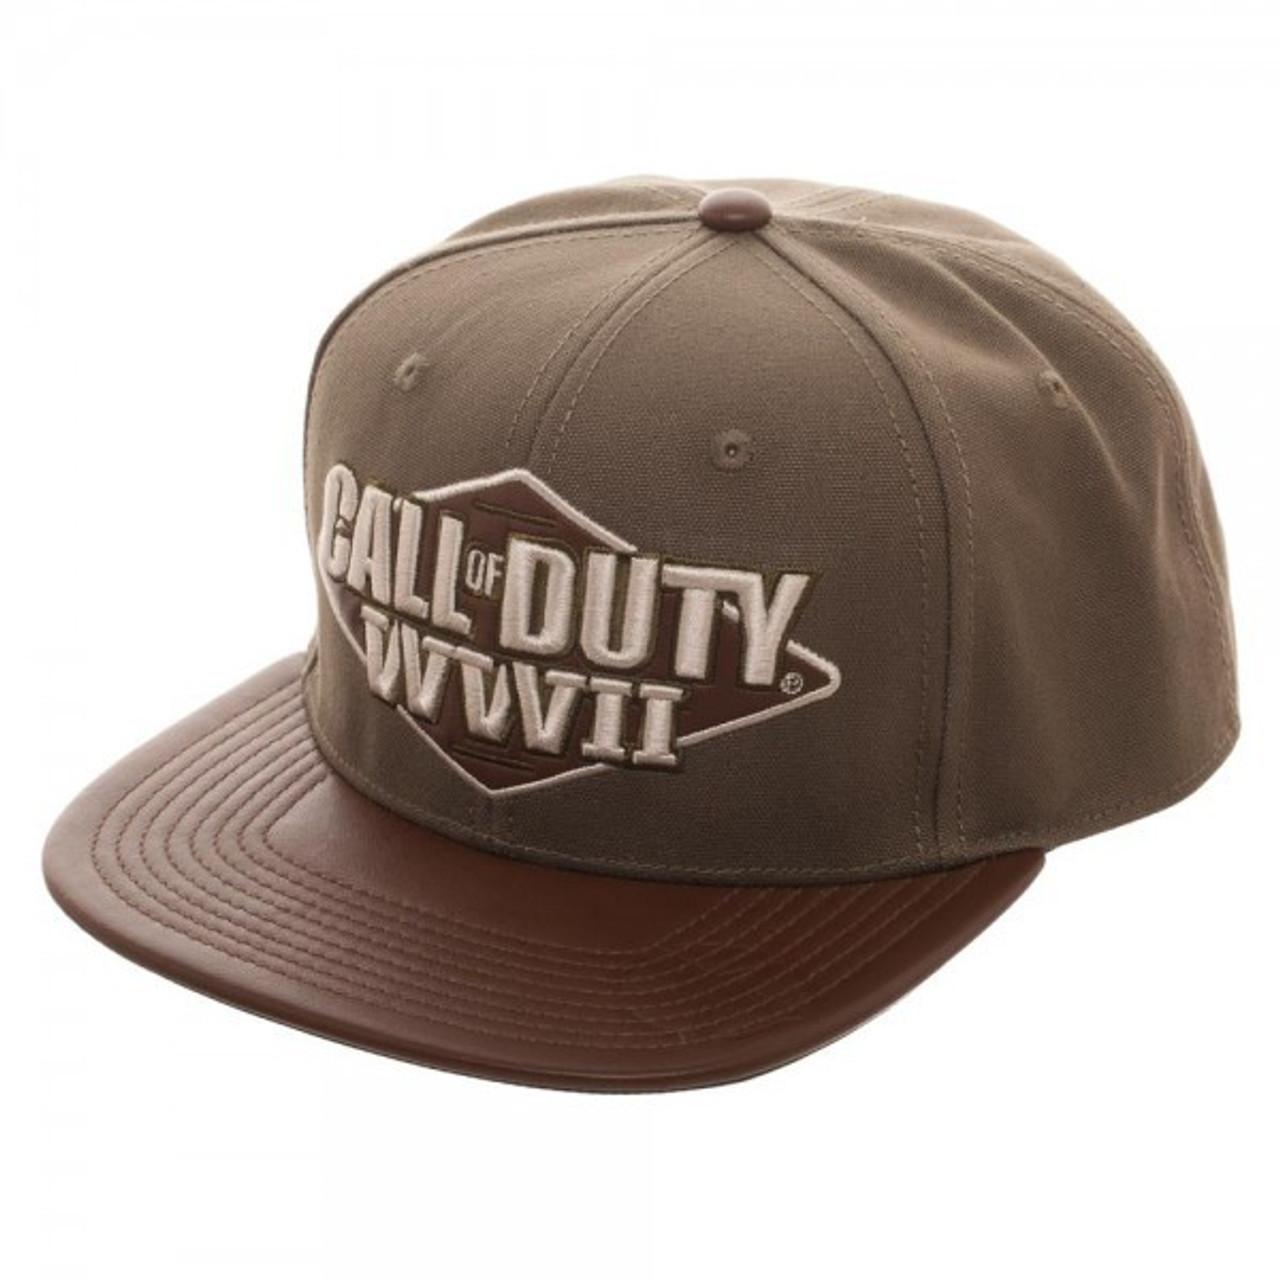 bd9cfc3fa Call of Duty World War II 3D Embroidered Snapback Cap